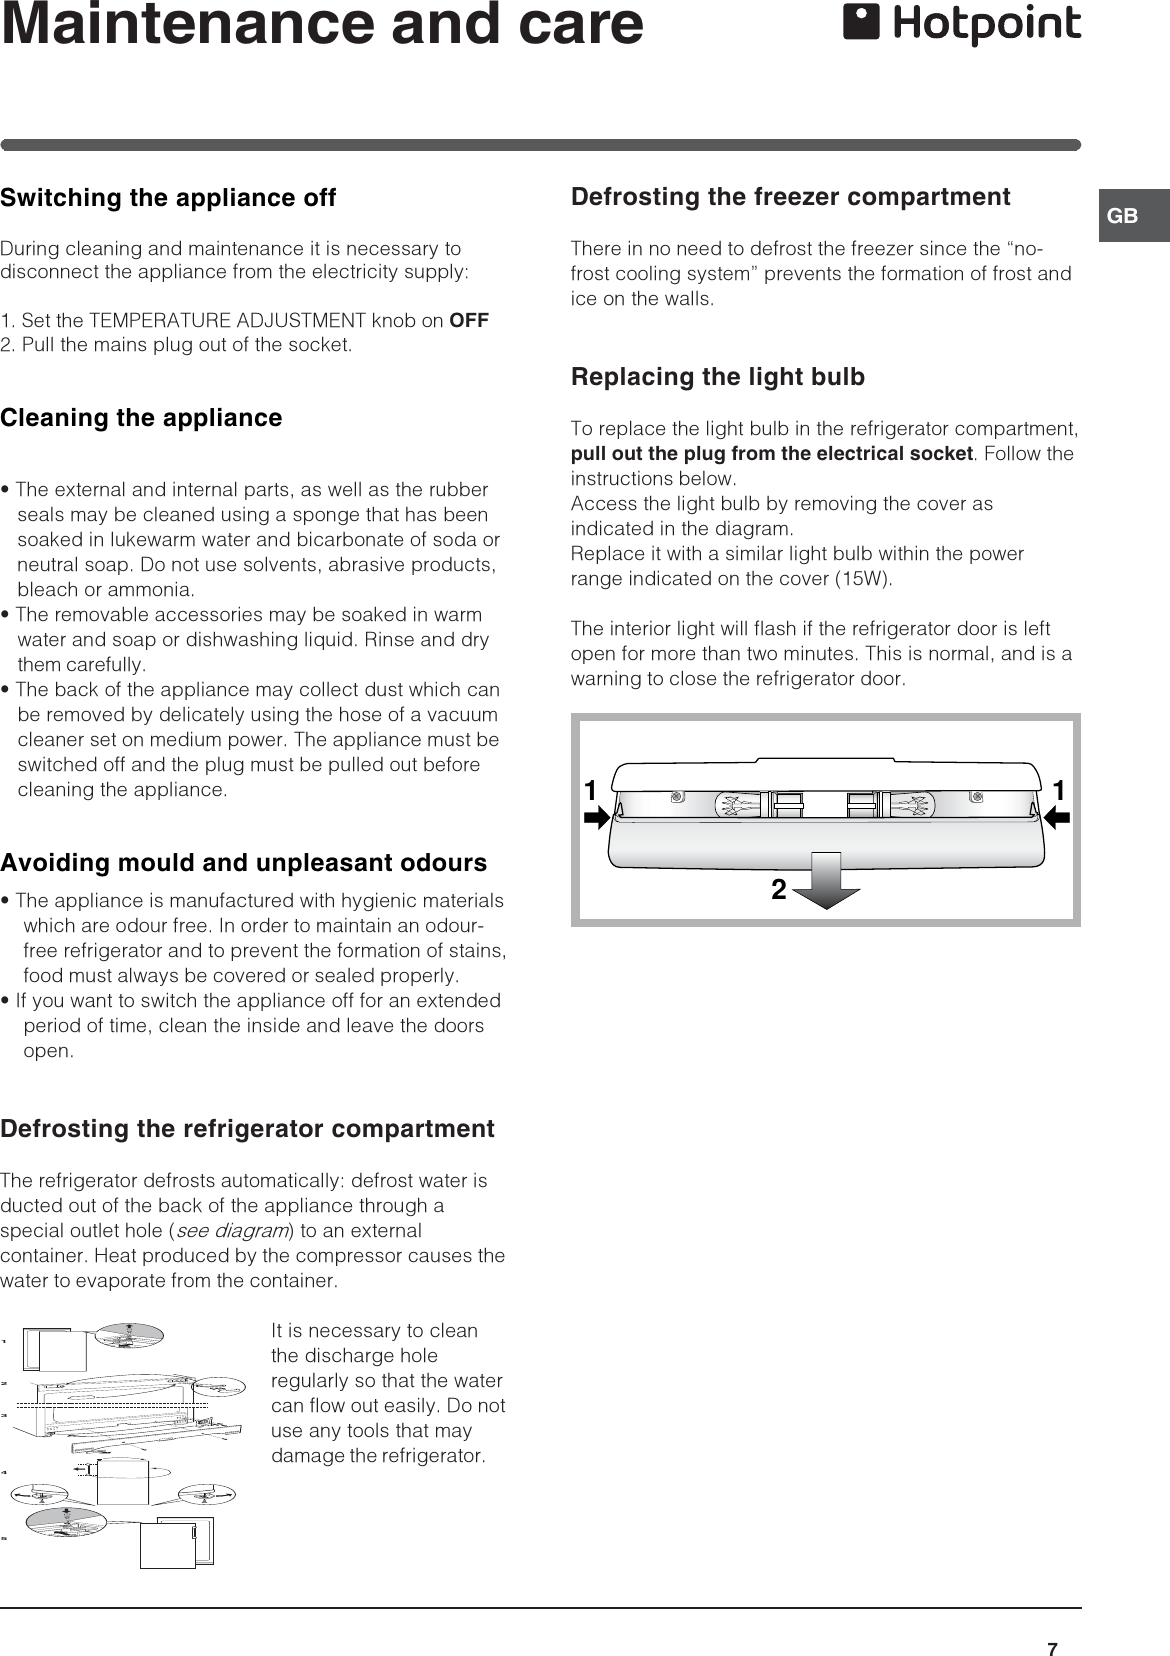 Hotpoint Refrigerator Ffp187Mg Users Manual 44802gb